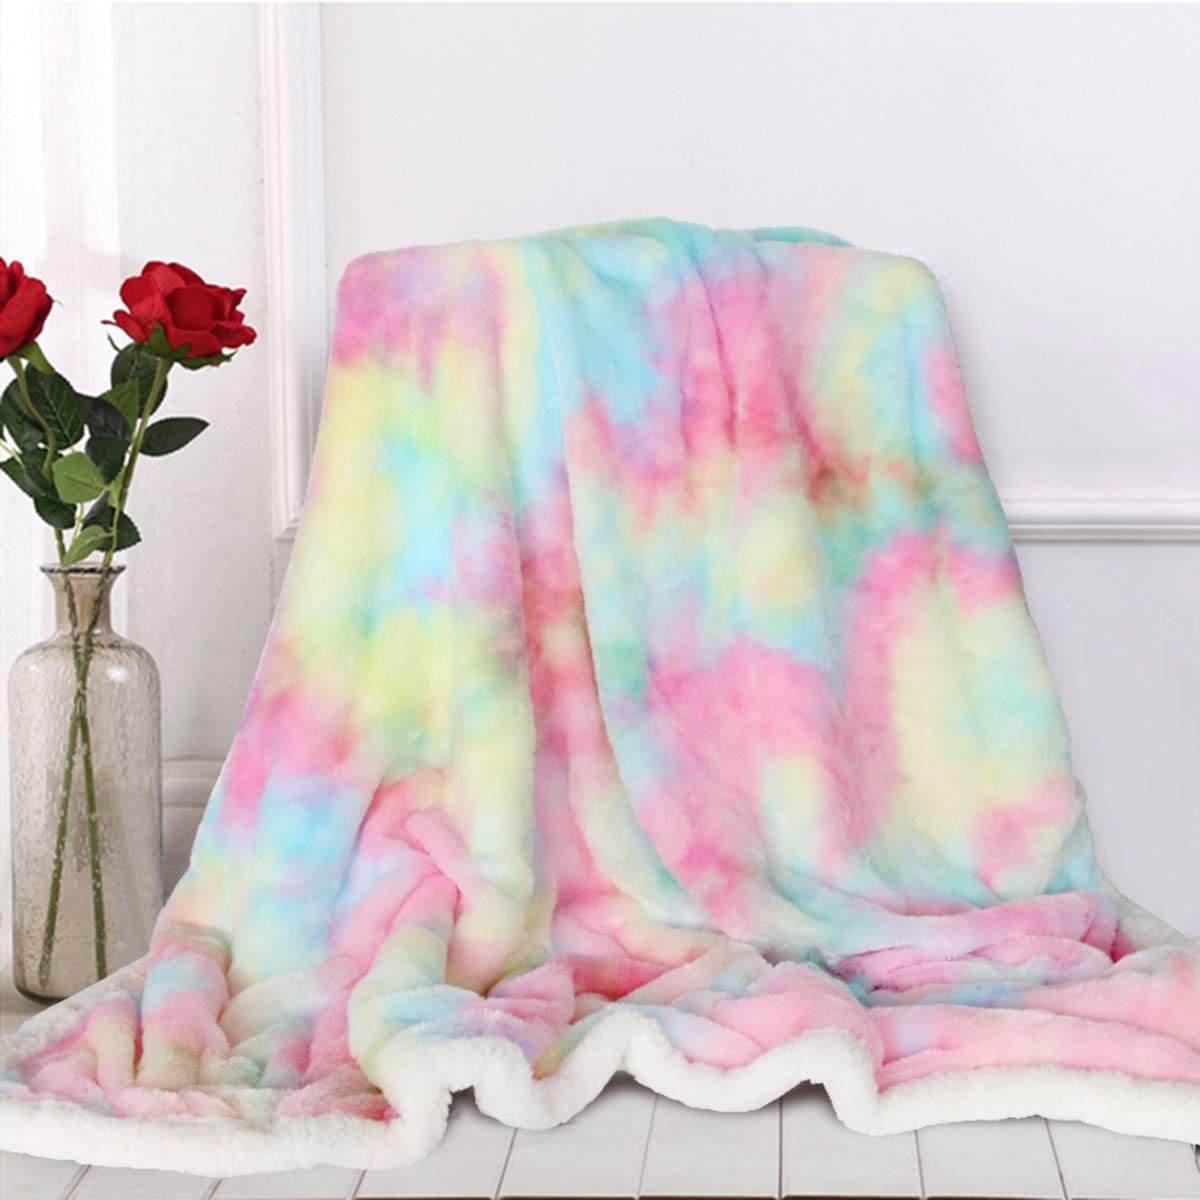 Sleepwish Fashionable Cute Fuzzy Unicorn Blanket - Decorative Girls Rainbow Ranking TOP18